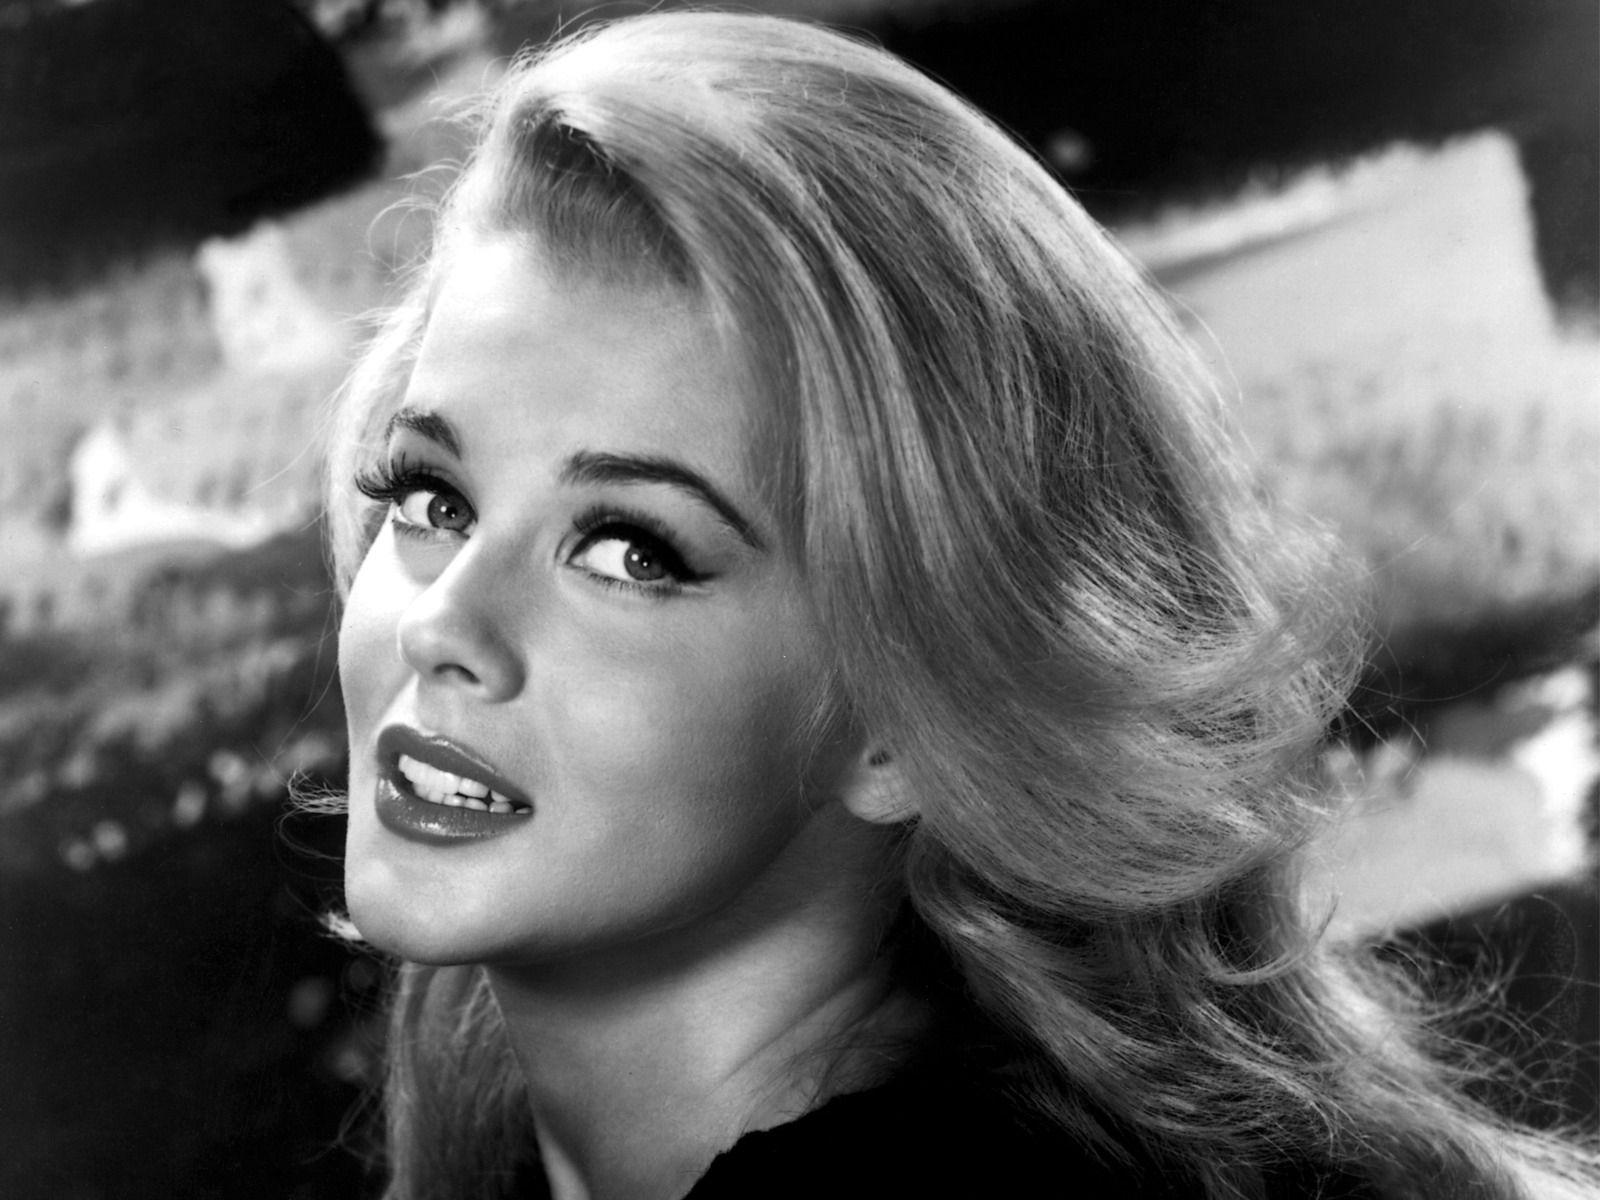 Ann margret ventage las divas pinterest actrices ann margret y marilyn monroe - Ann diva del passato ...